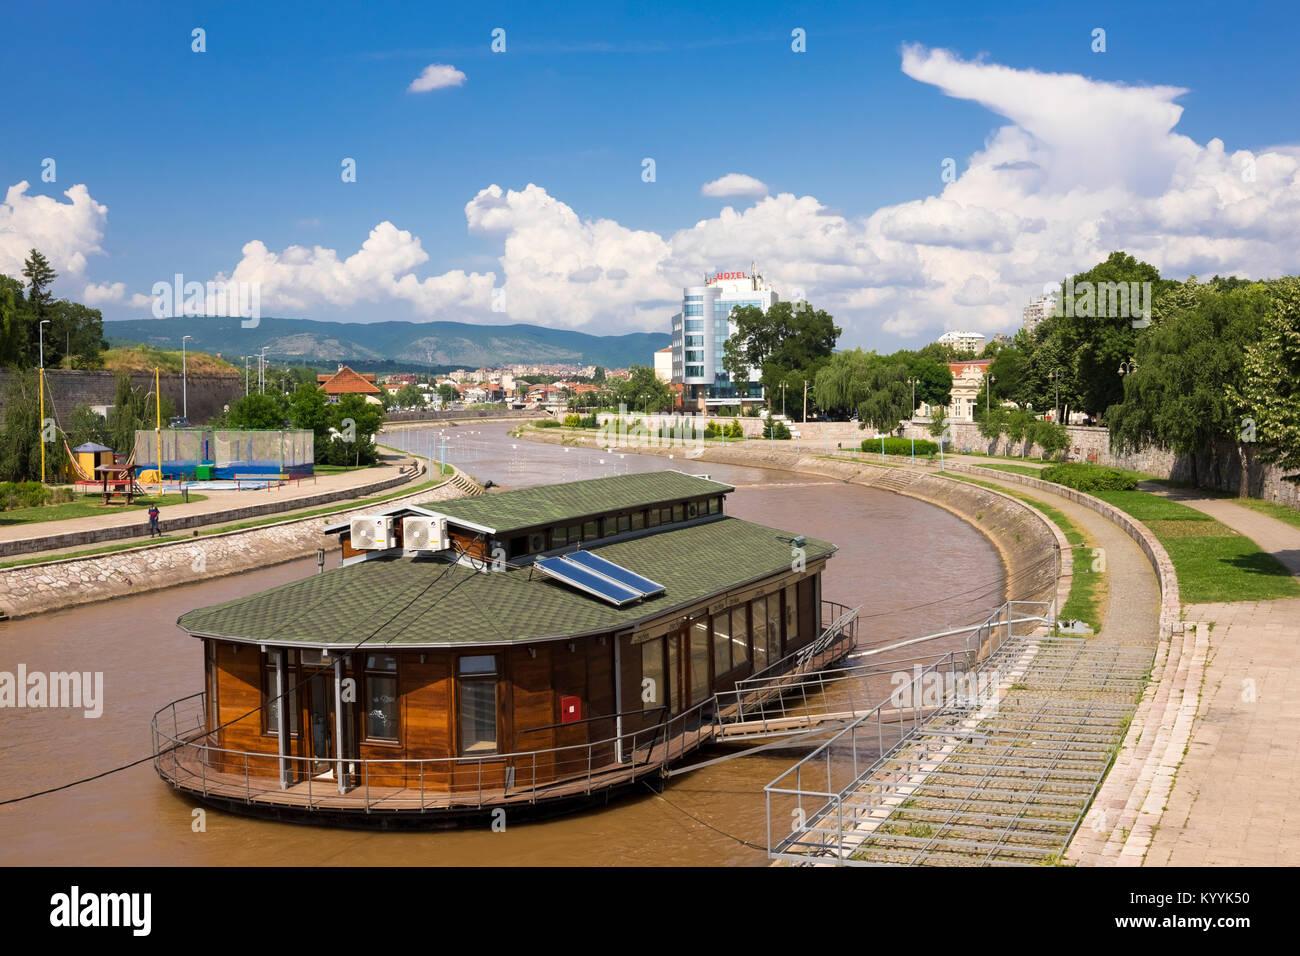 Porto Bello Boat Cafe on the river Nisava in Nis, Serbia, Europe - Stock Image